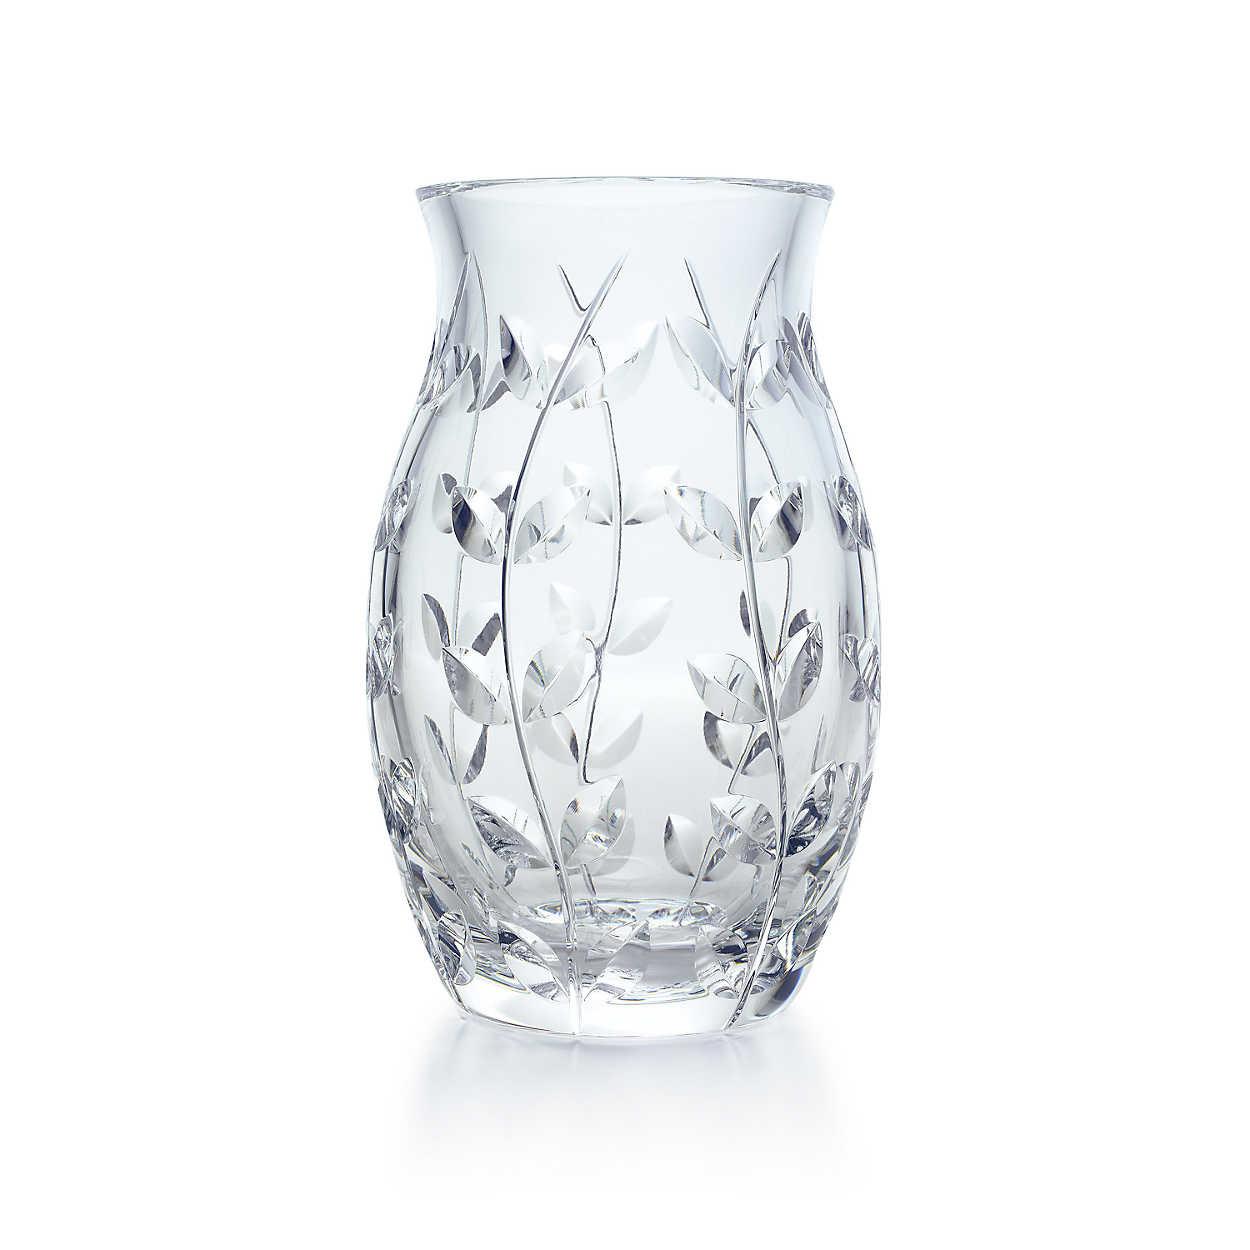 tiffany bud vase of vintage vases vase and cellar image avorcor com inside vine white vases vase and cellar image avorcor